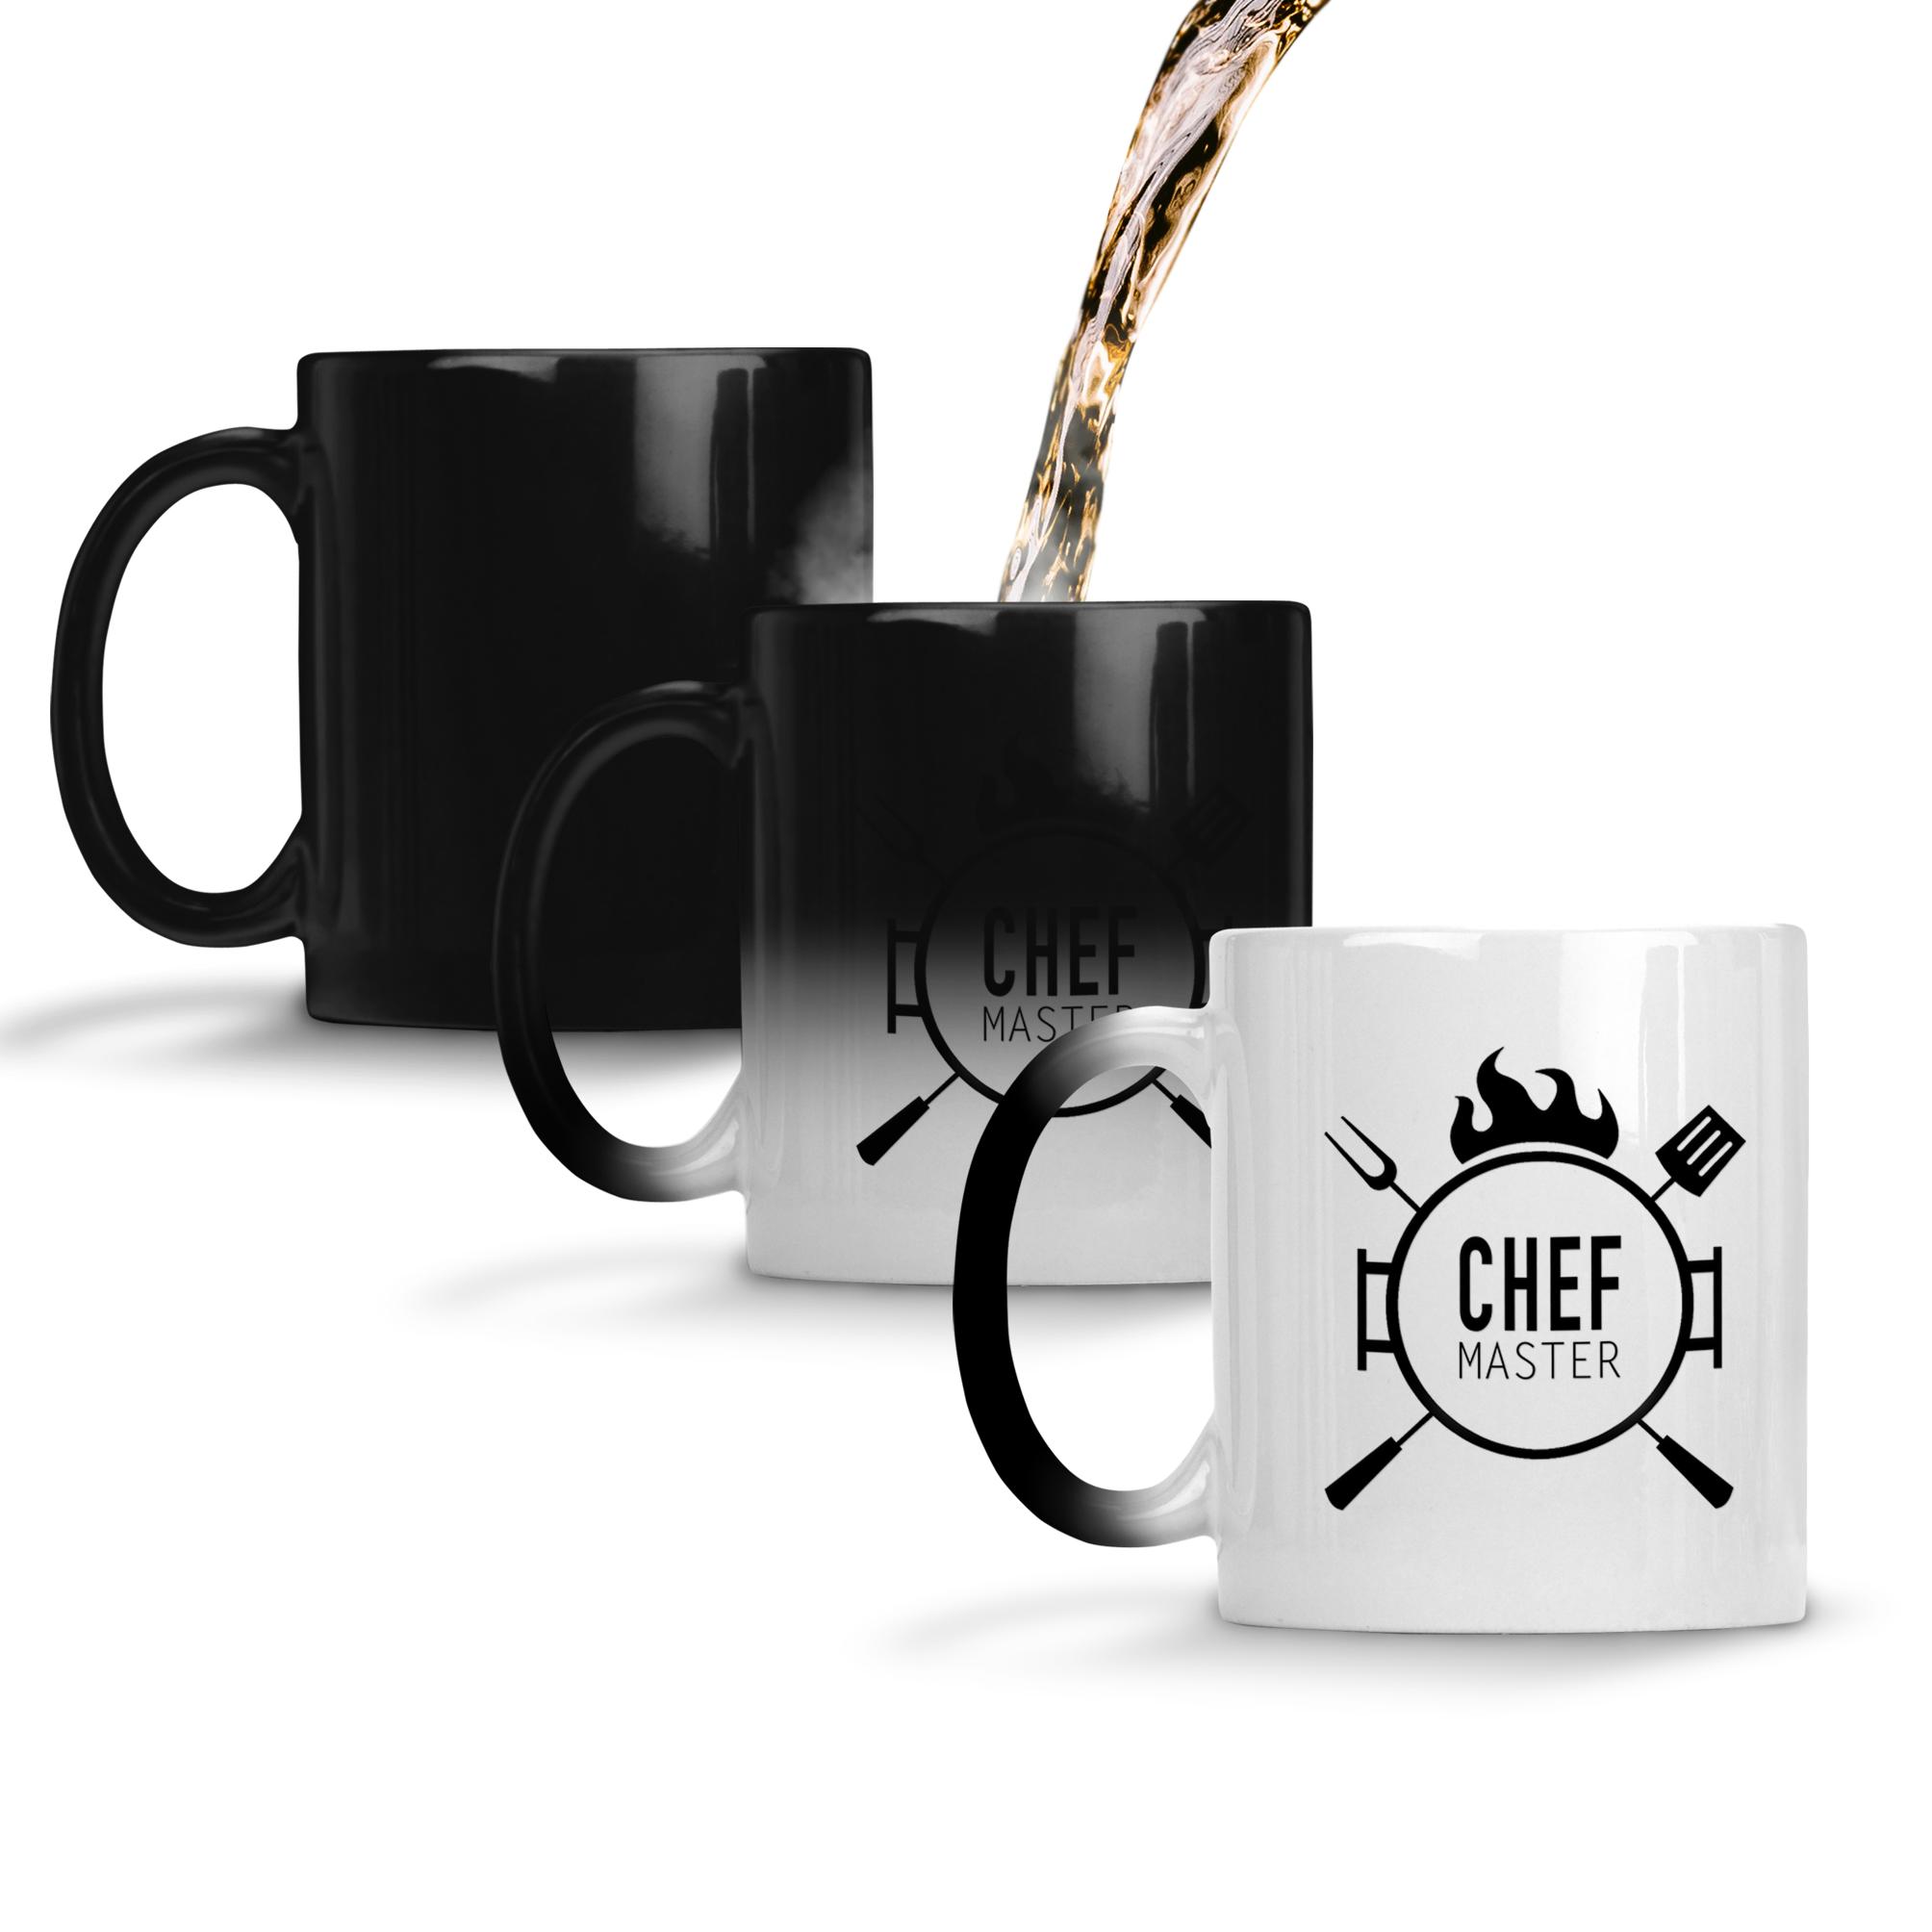 kubek_zmiana_temp_master_chef